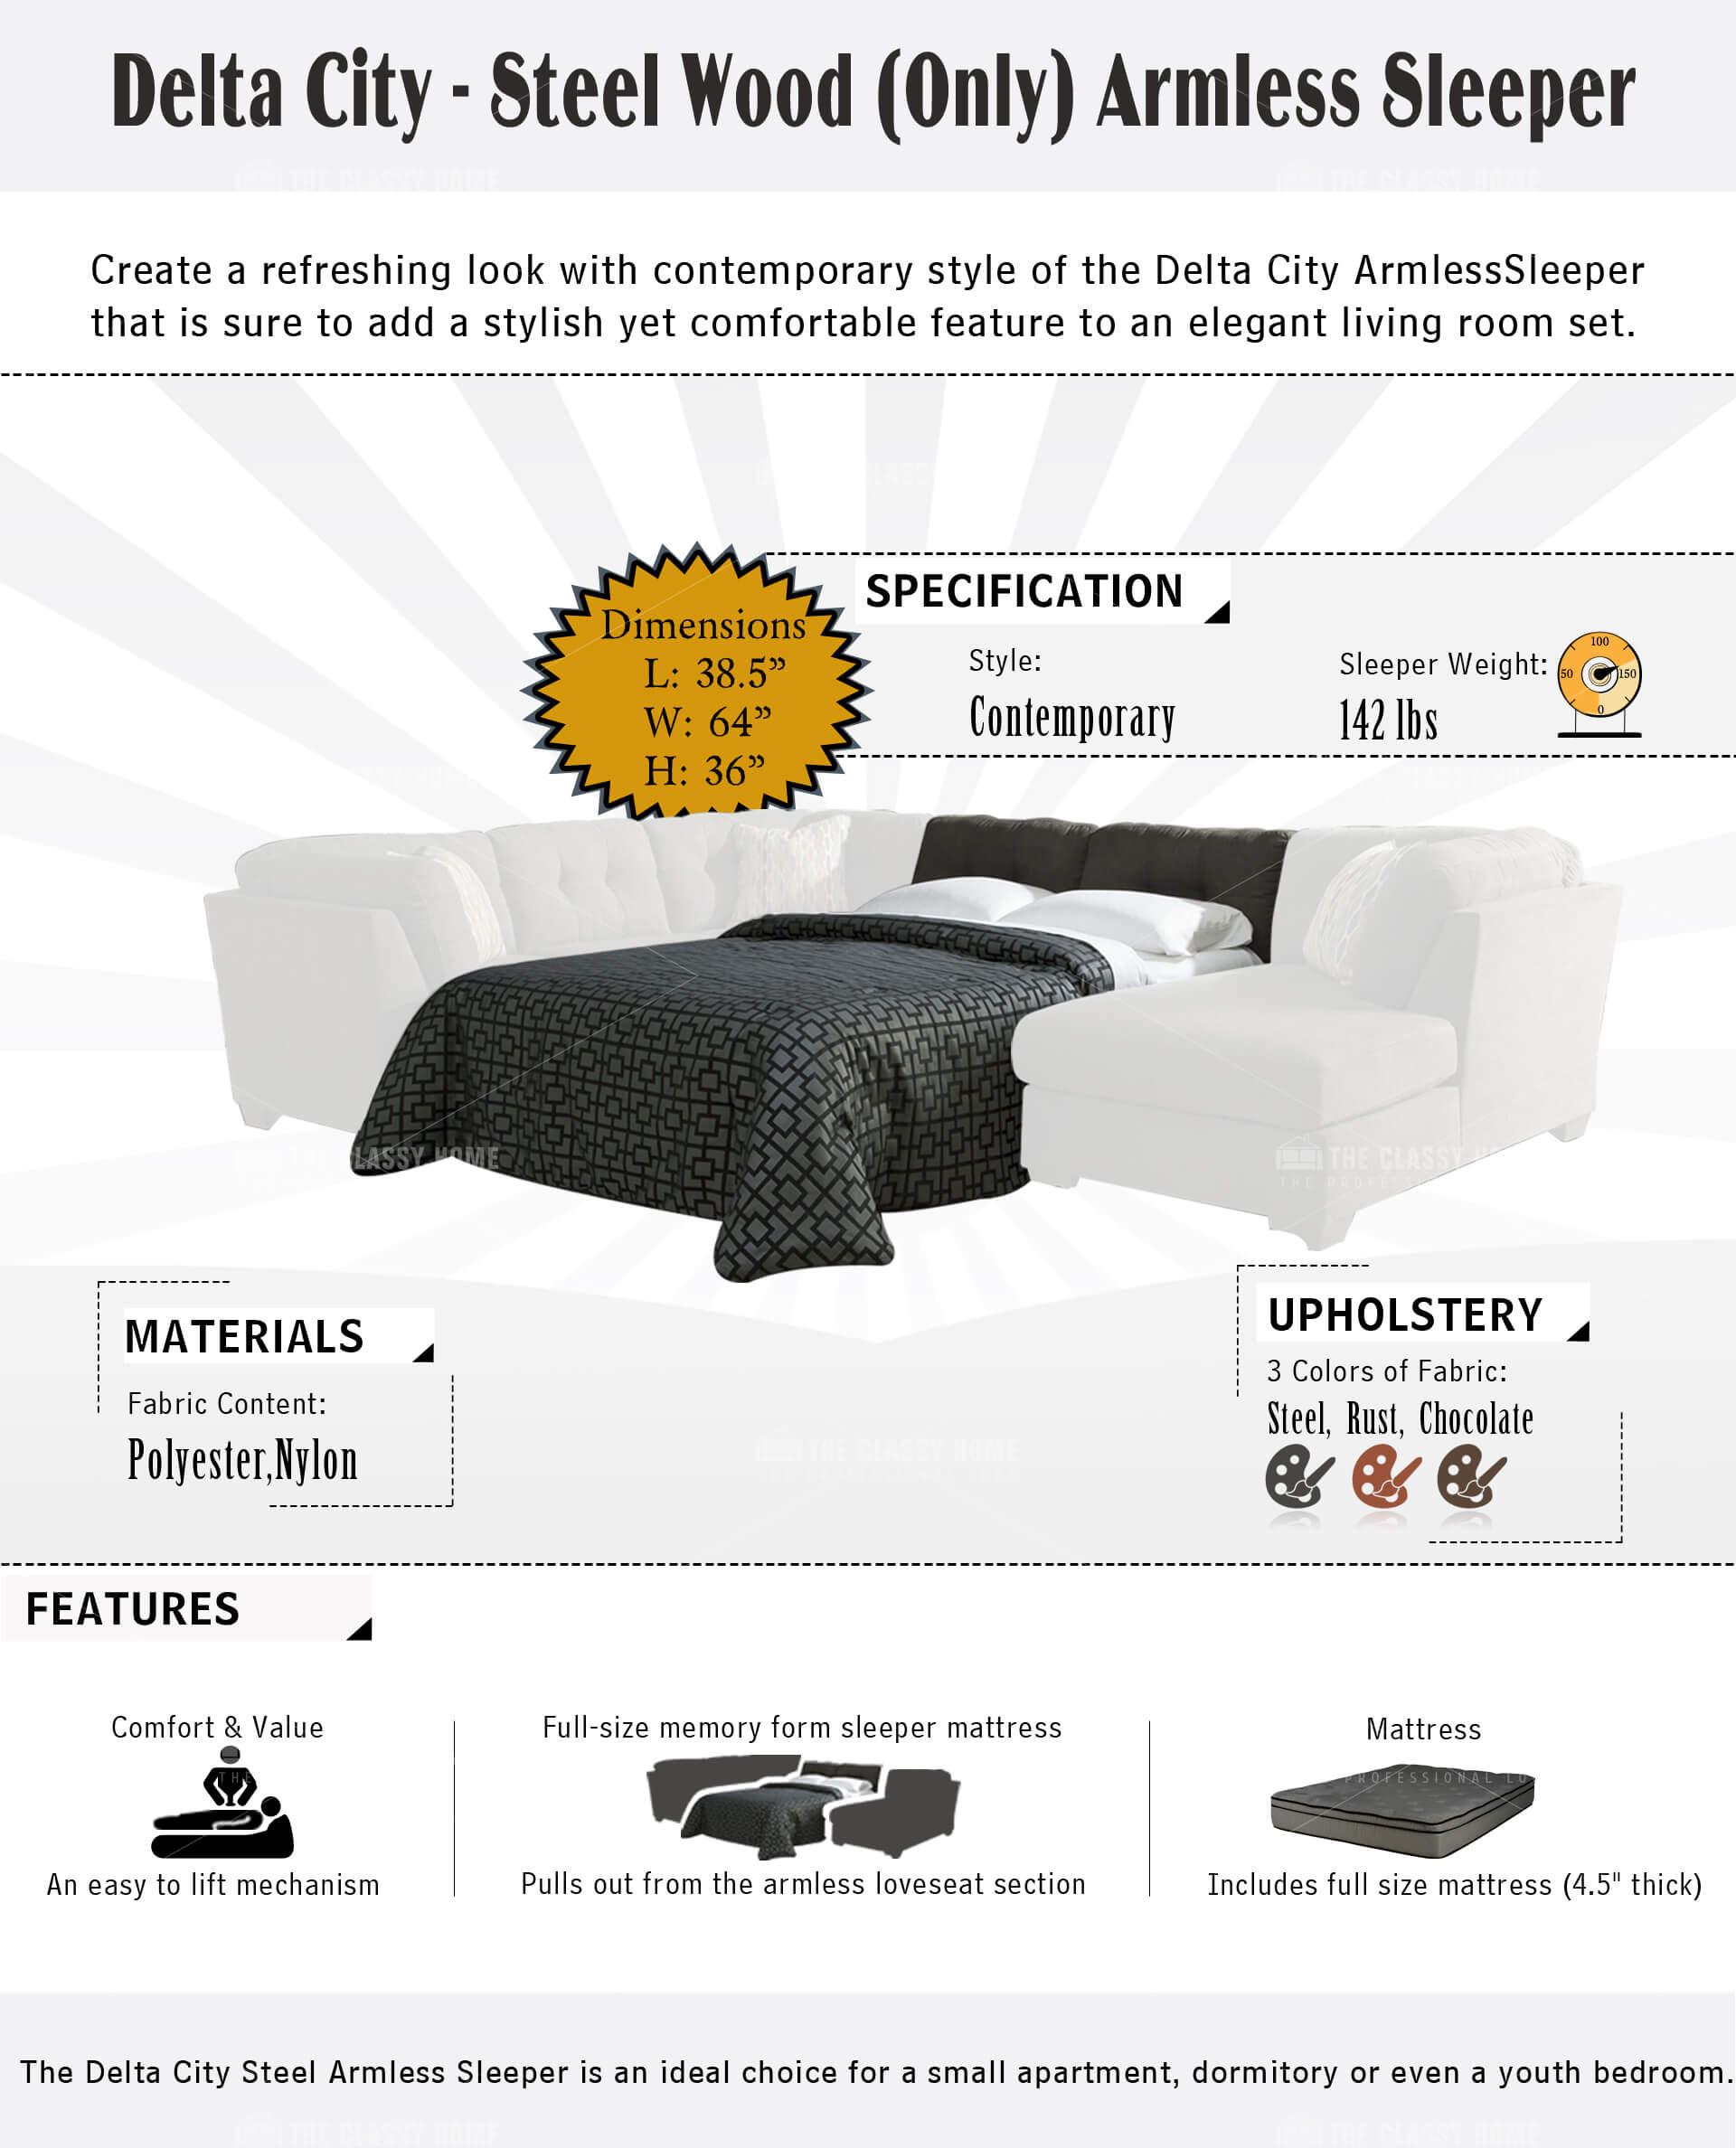 Surprising Ashley Furniture Delta City Armless Sleeper Beatyapartments Chair Design Images Beatyapartmentscom